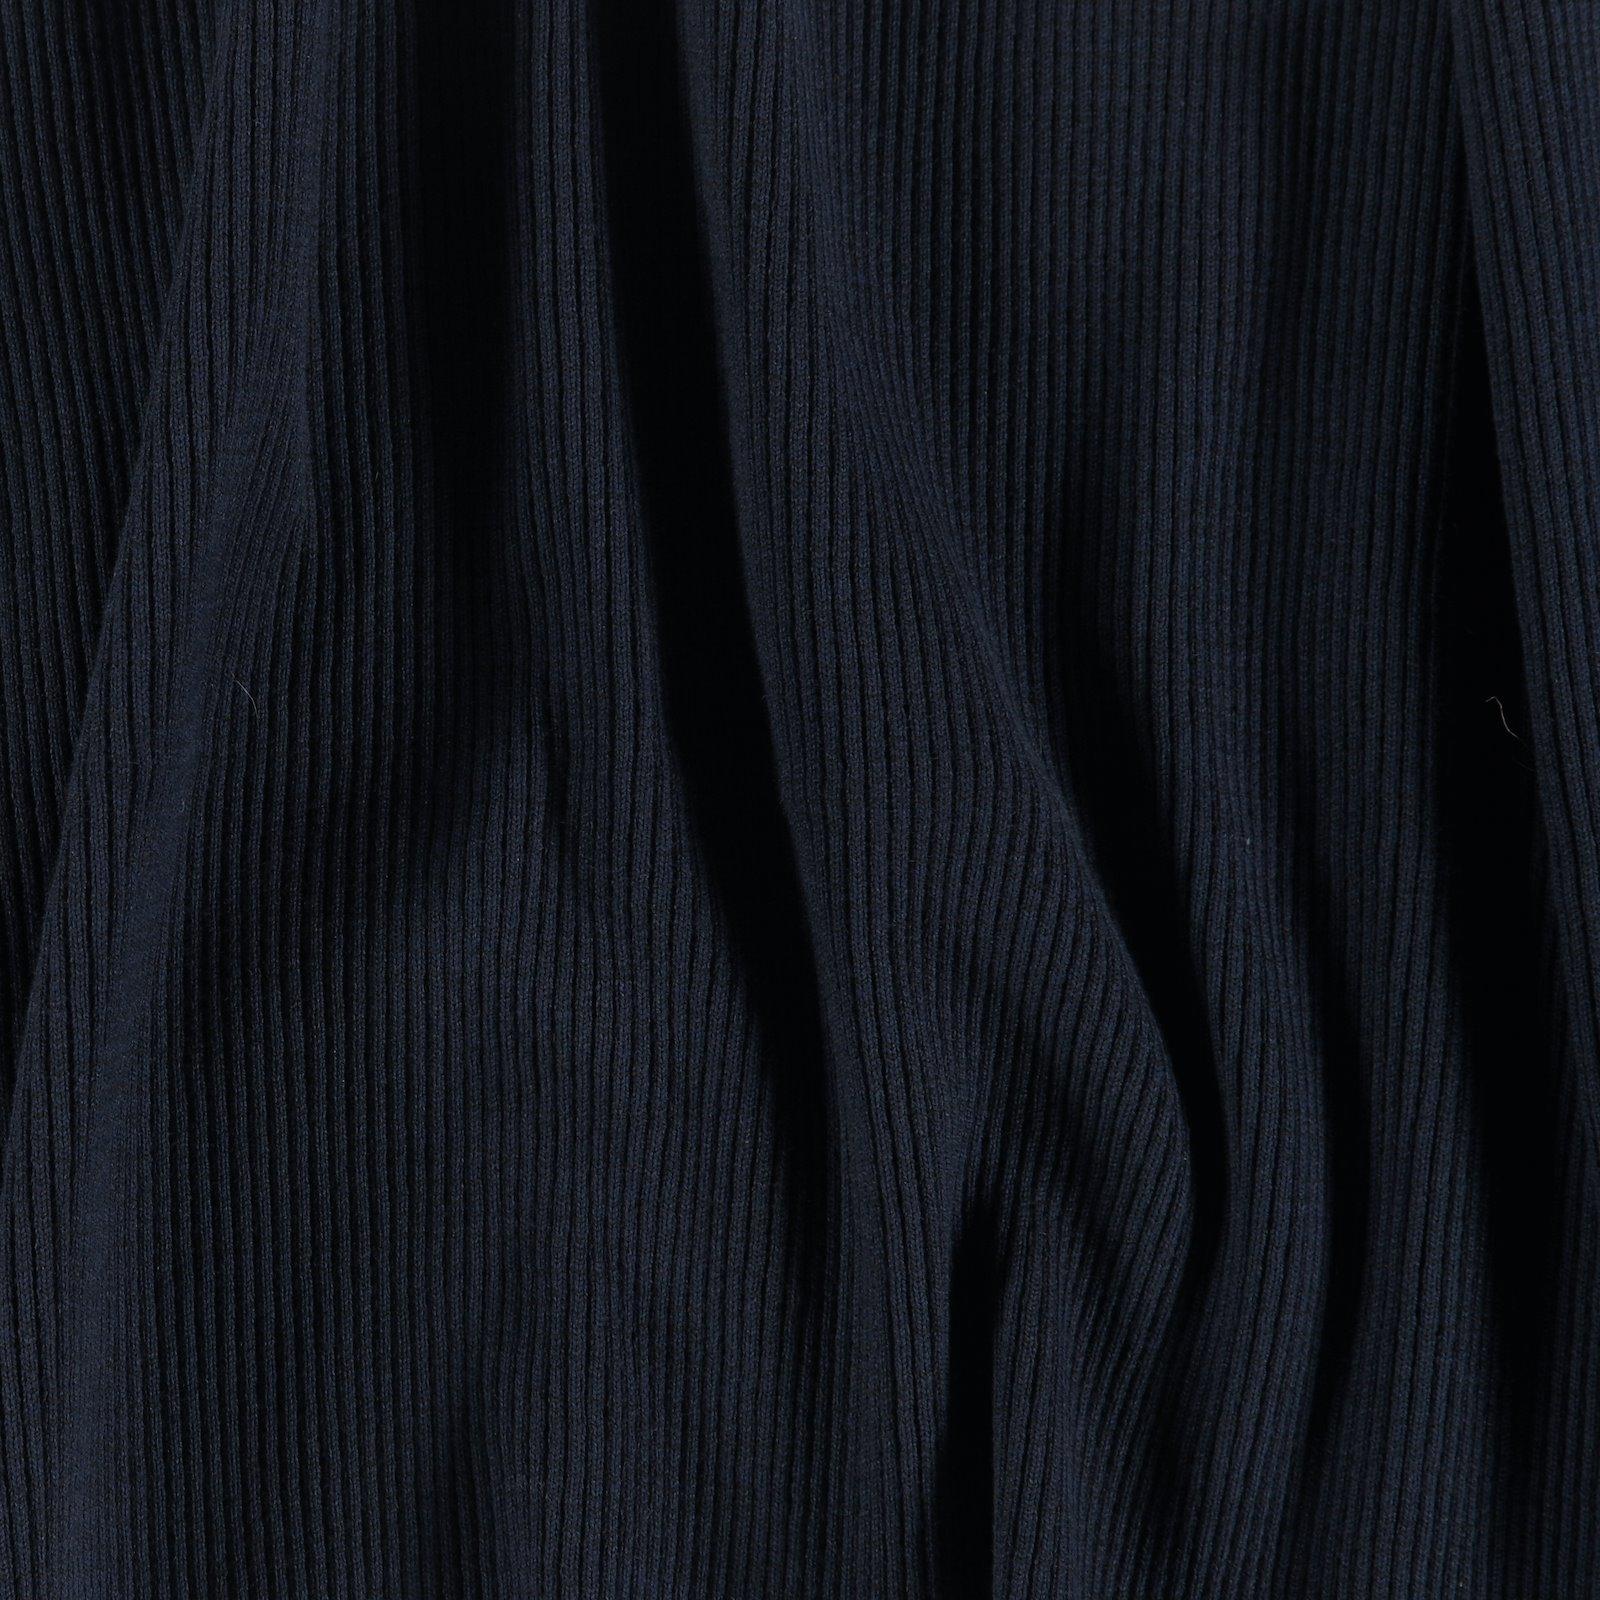 Rib-Jersey 2x2, 30x100cm navy, 1 St.